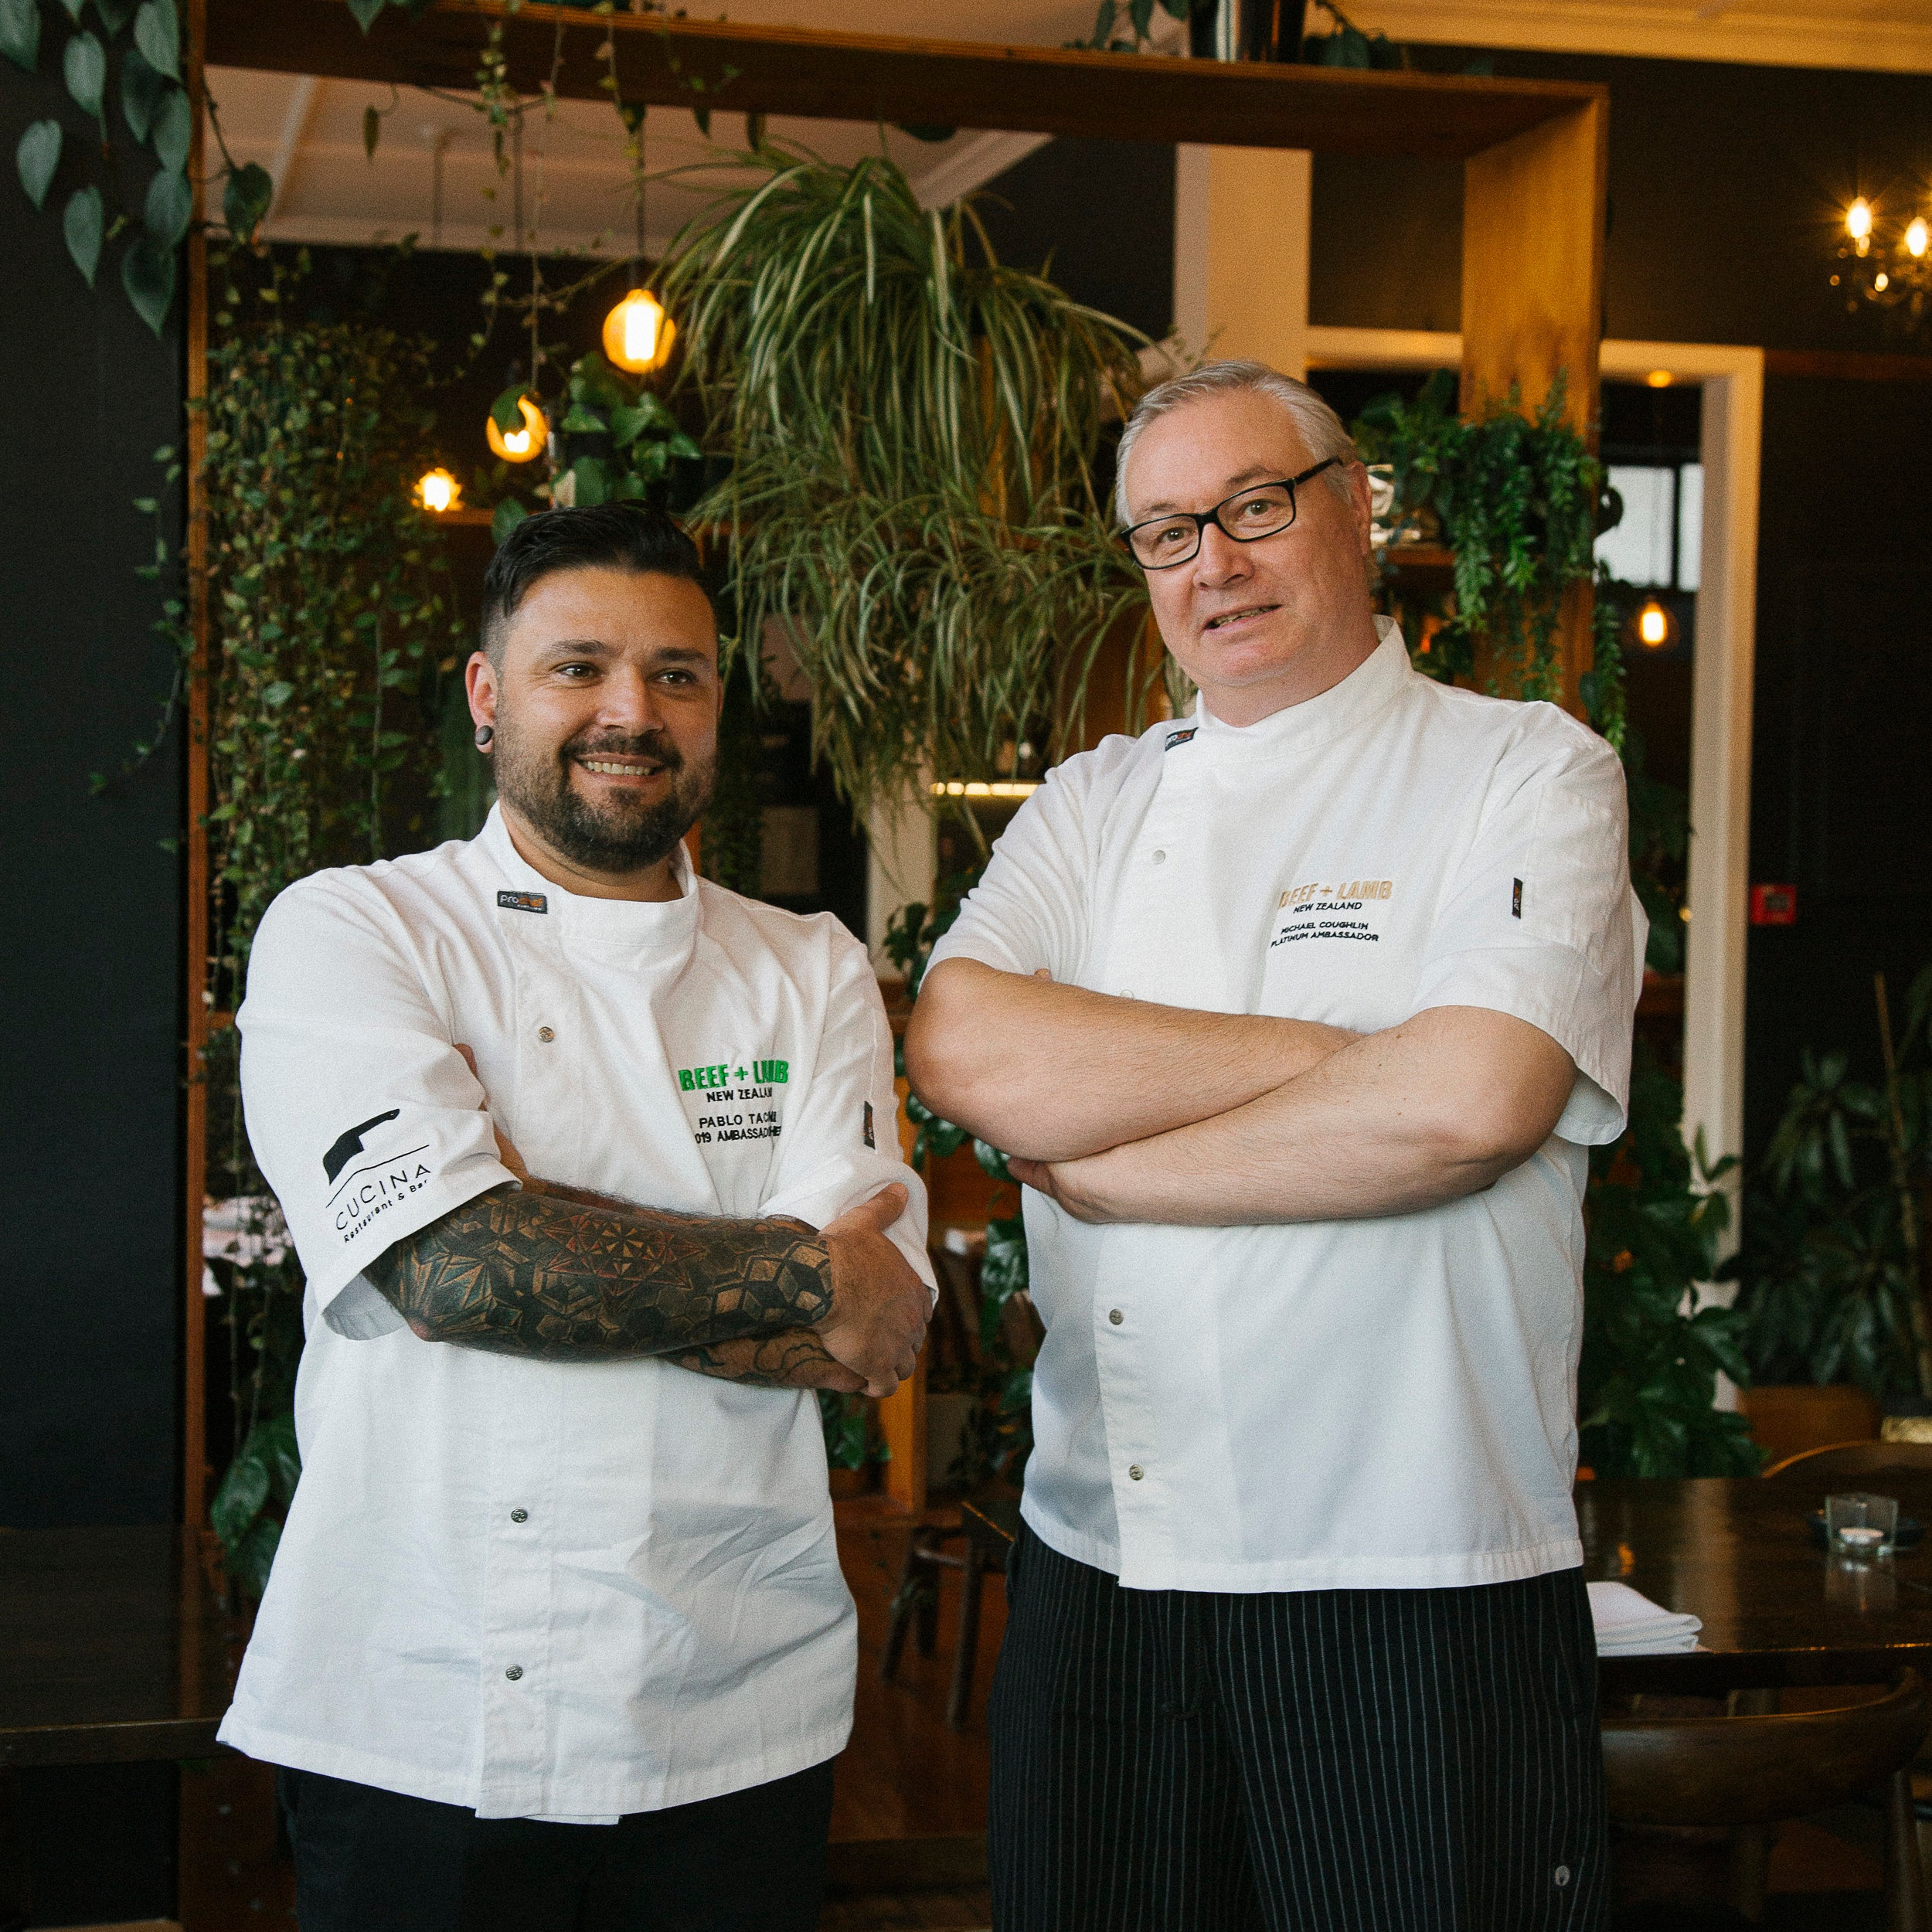 Chefs, Pablo Tacchini and Michael Coughlin